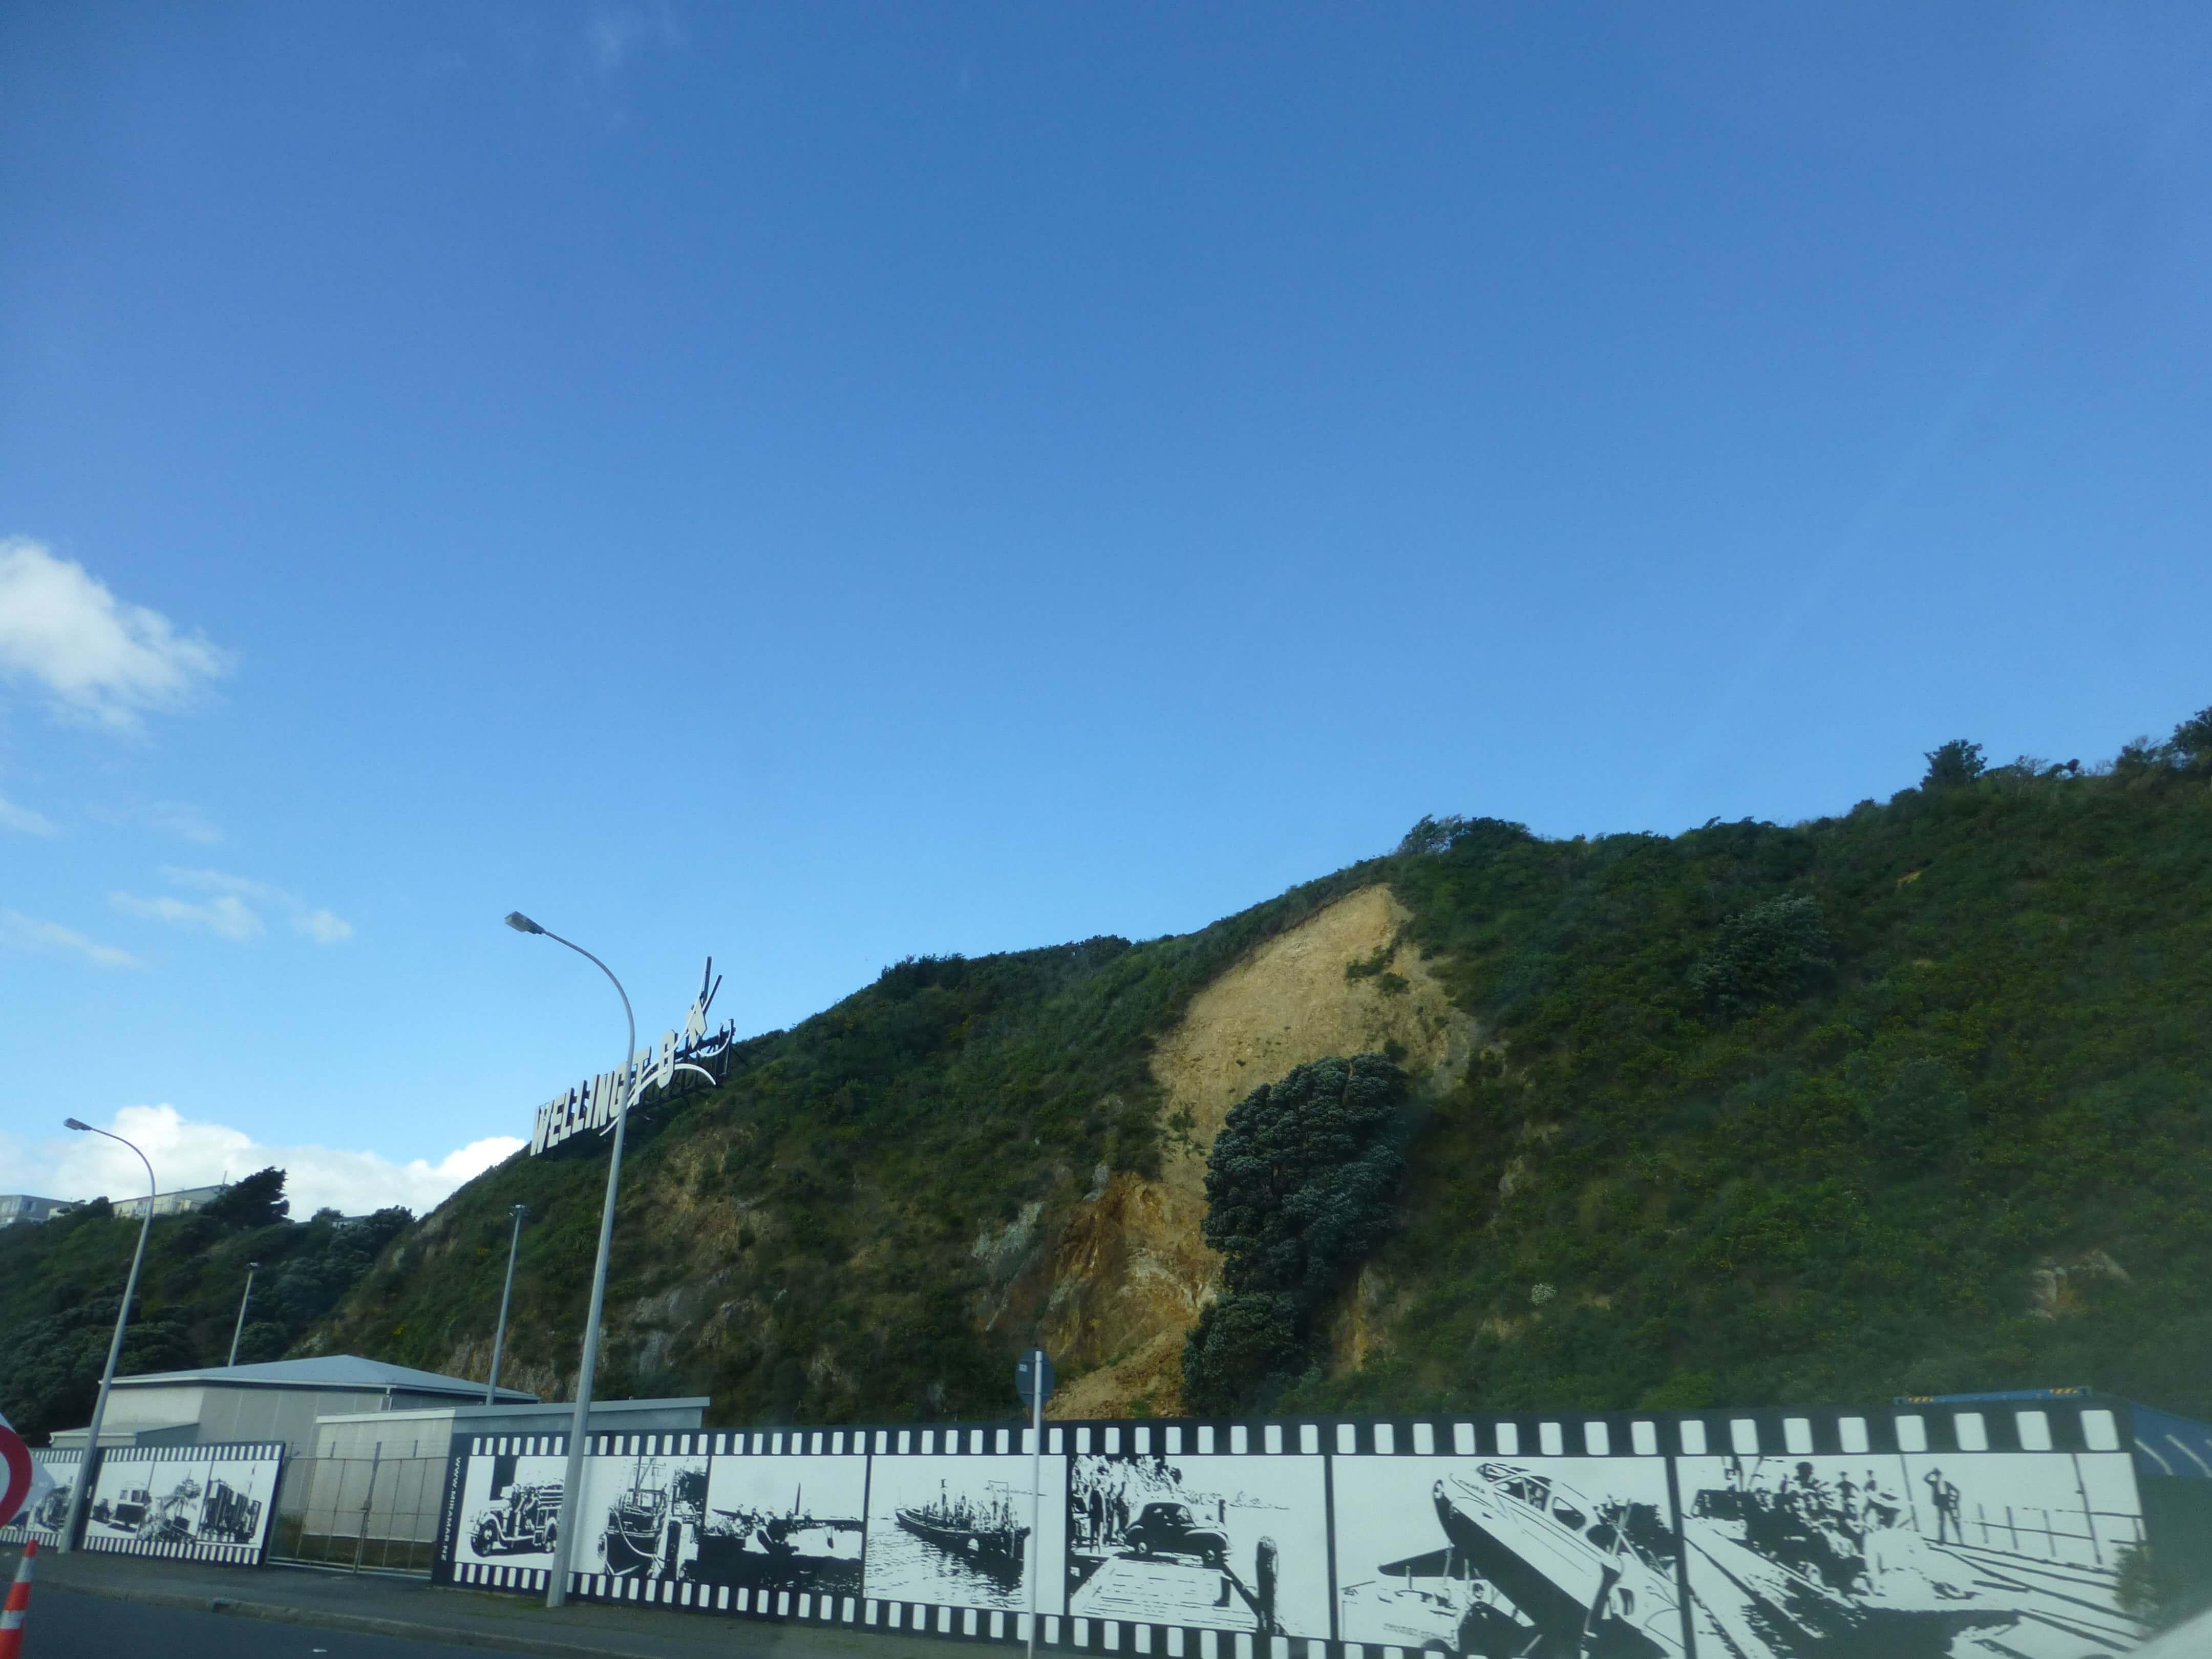 am Wellington Sign, Neuseeland, Weit-weg.reisen